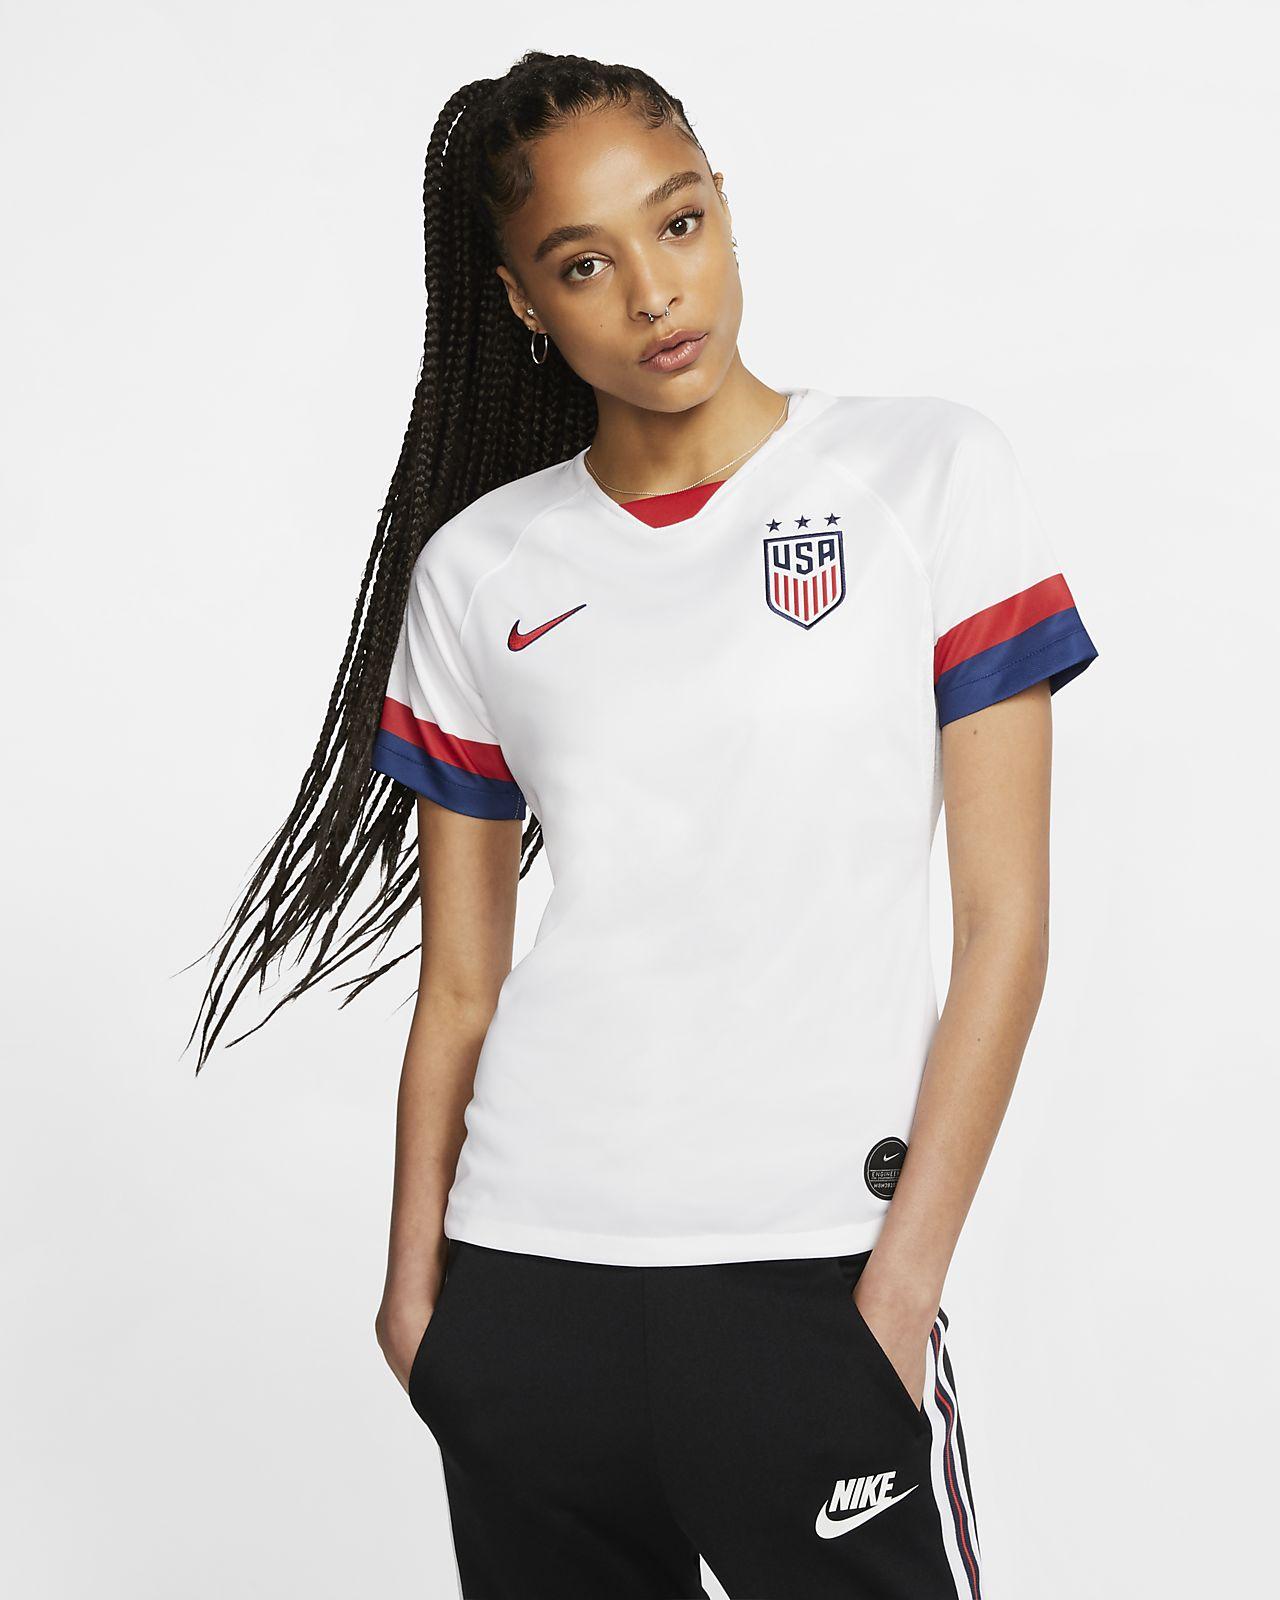 b13f729ac U.S. 2019 Stadium Home Women's Soccer Jersey. Nike.com